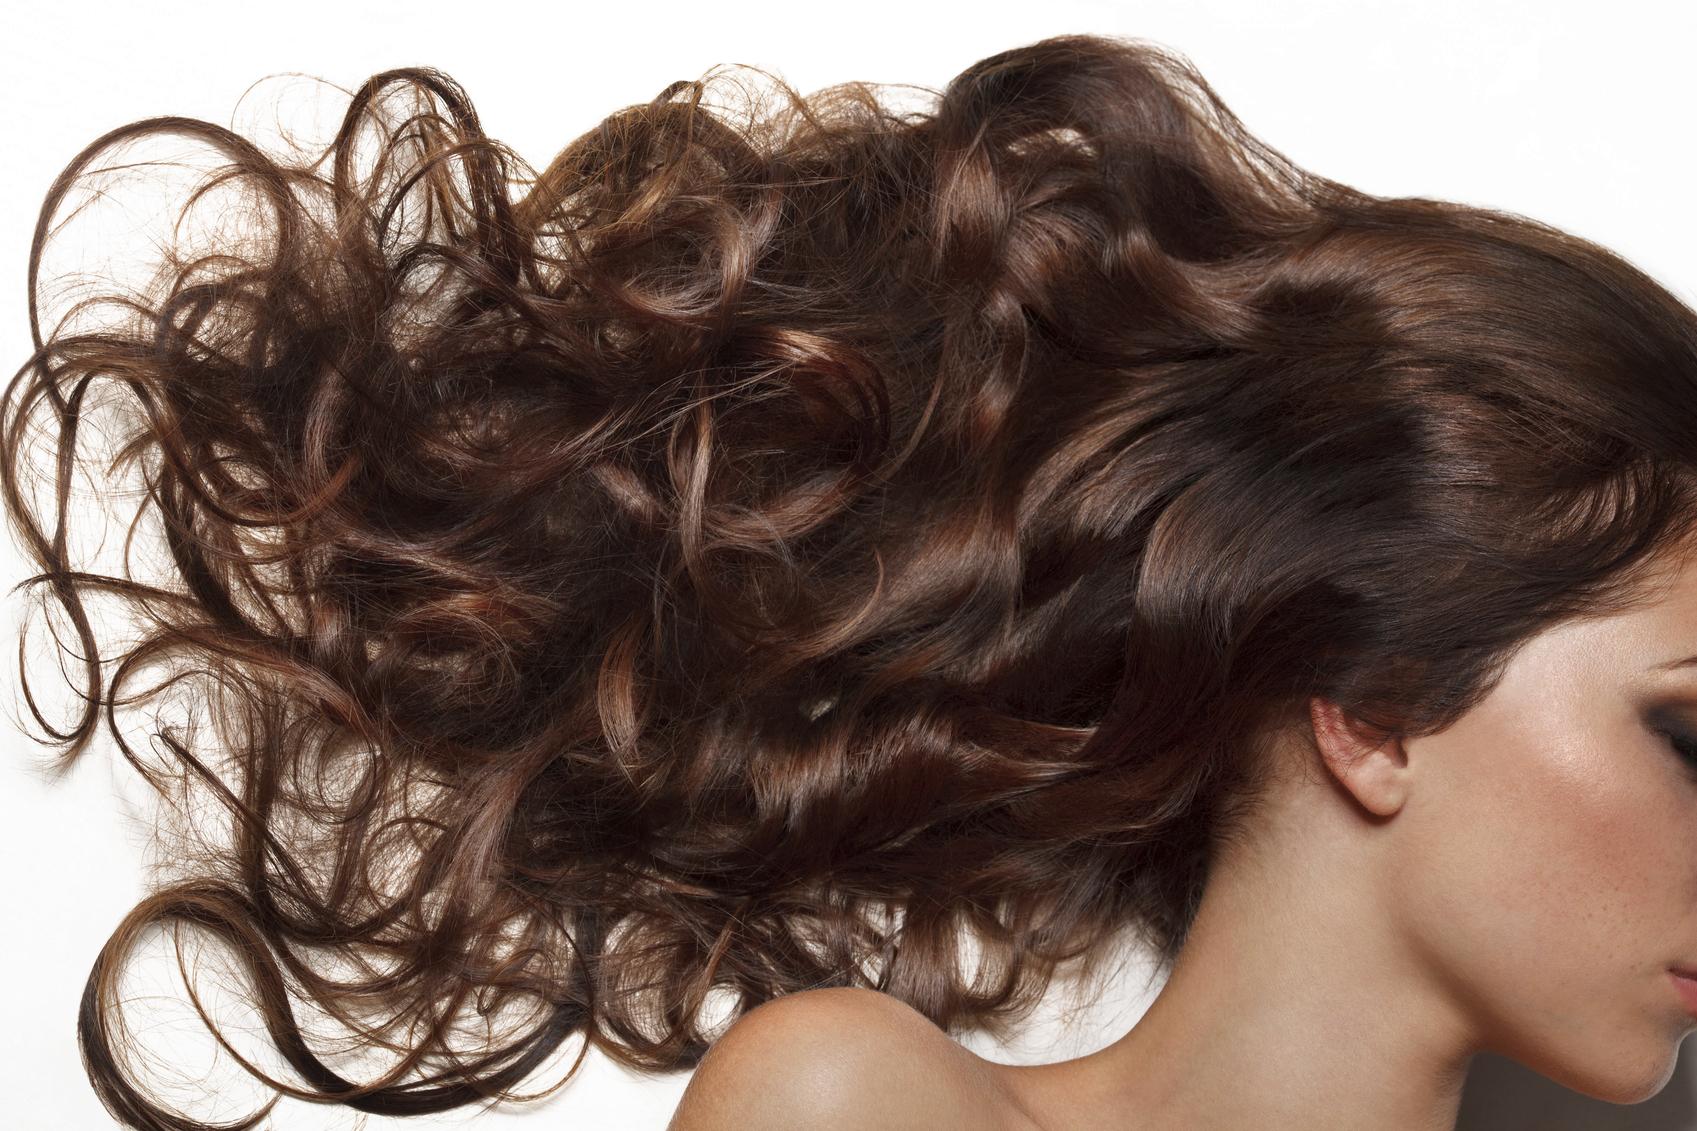 Pear and Vanilla Hair Masque